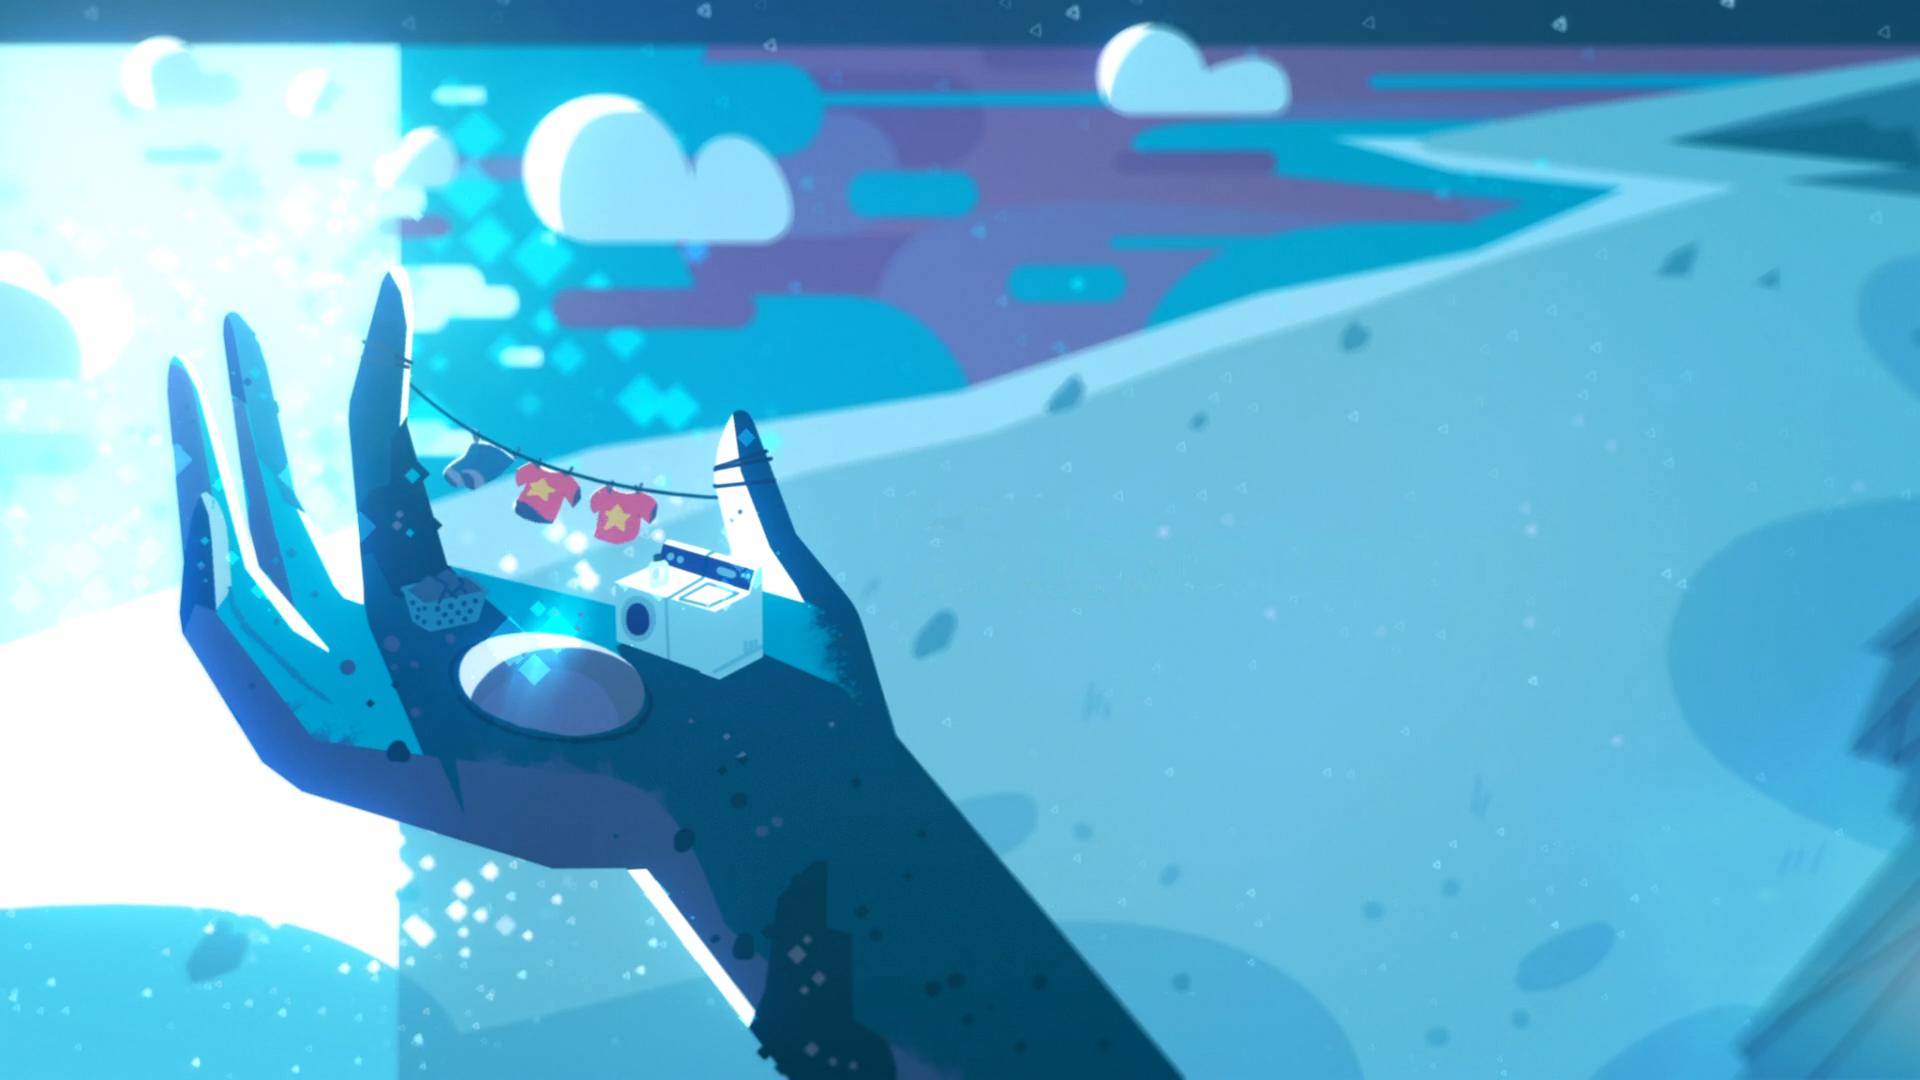 Cute Desktop Backgrounds Download Free 4k Full Hd Wallpapers Background Images In 2020 Steven Universe Wallpaper Steven Universe Ending Steven Universe